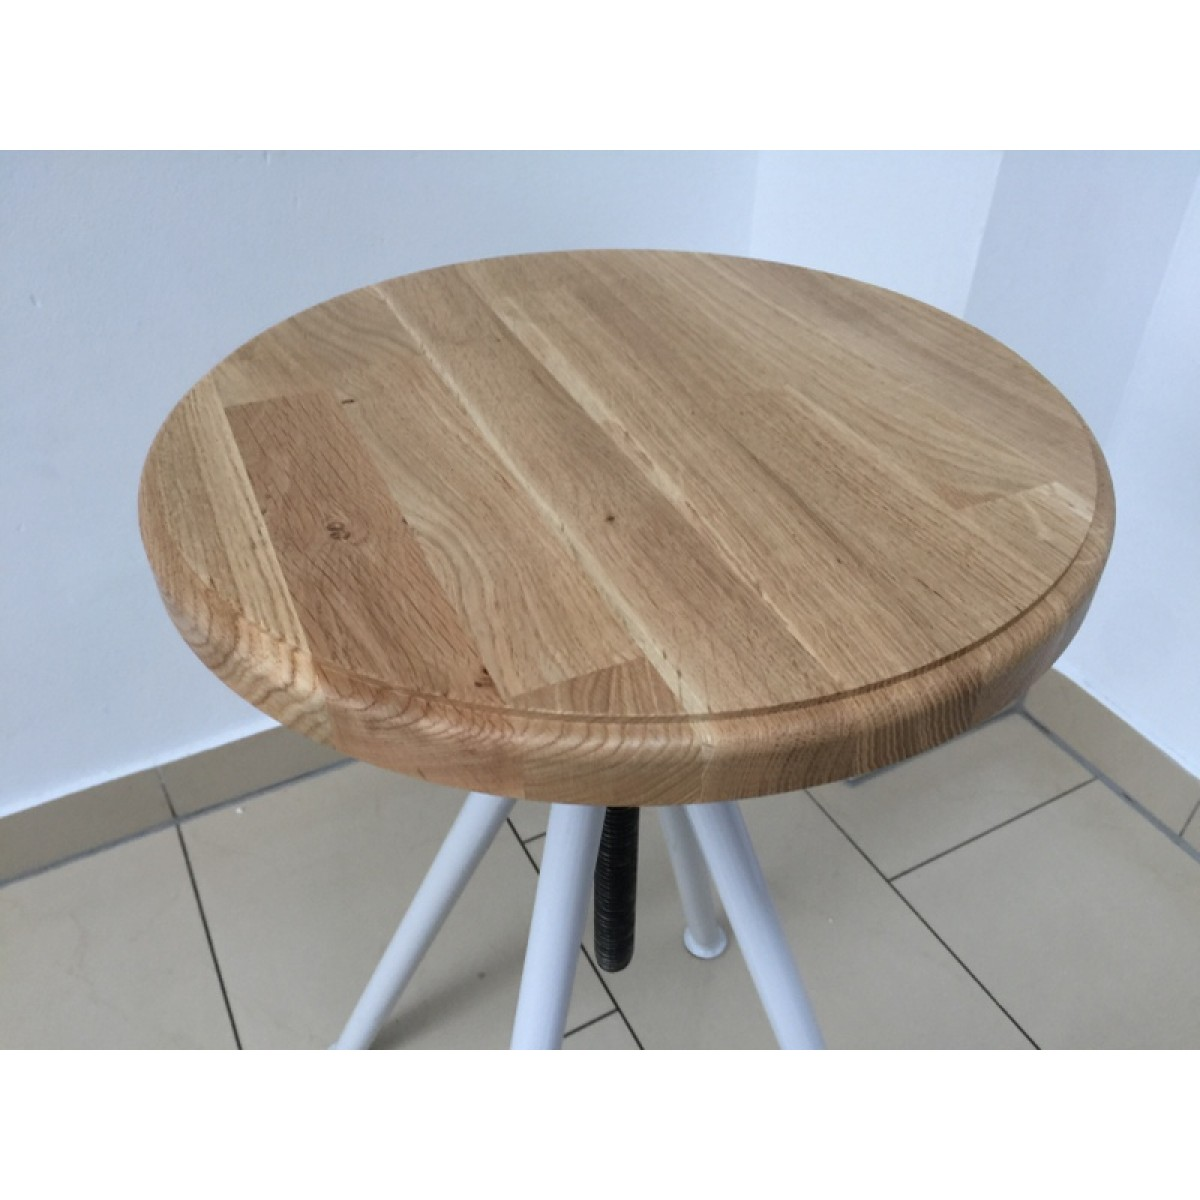 Hocker verstellbar im industriedesign barhocker sitzh he for Barhocker 66 cm